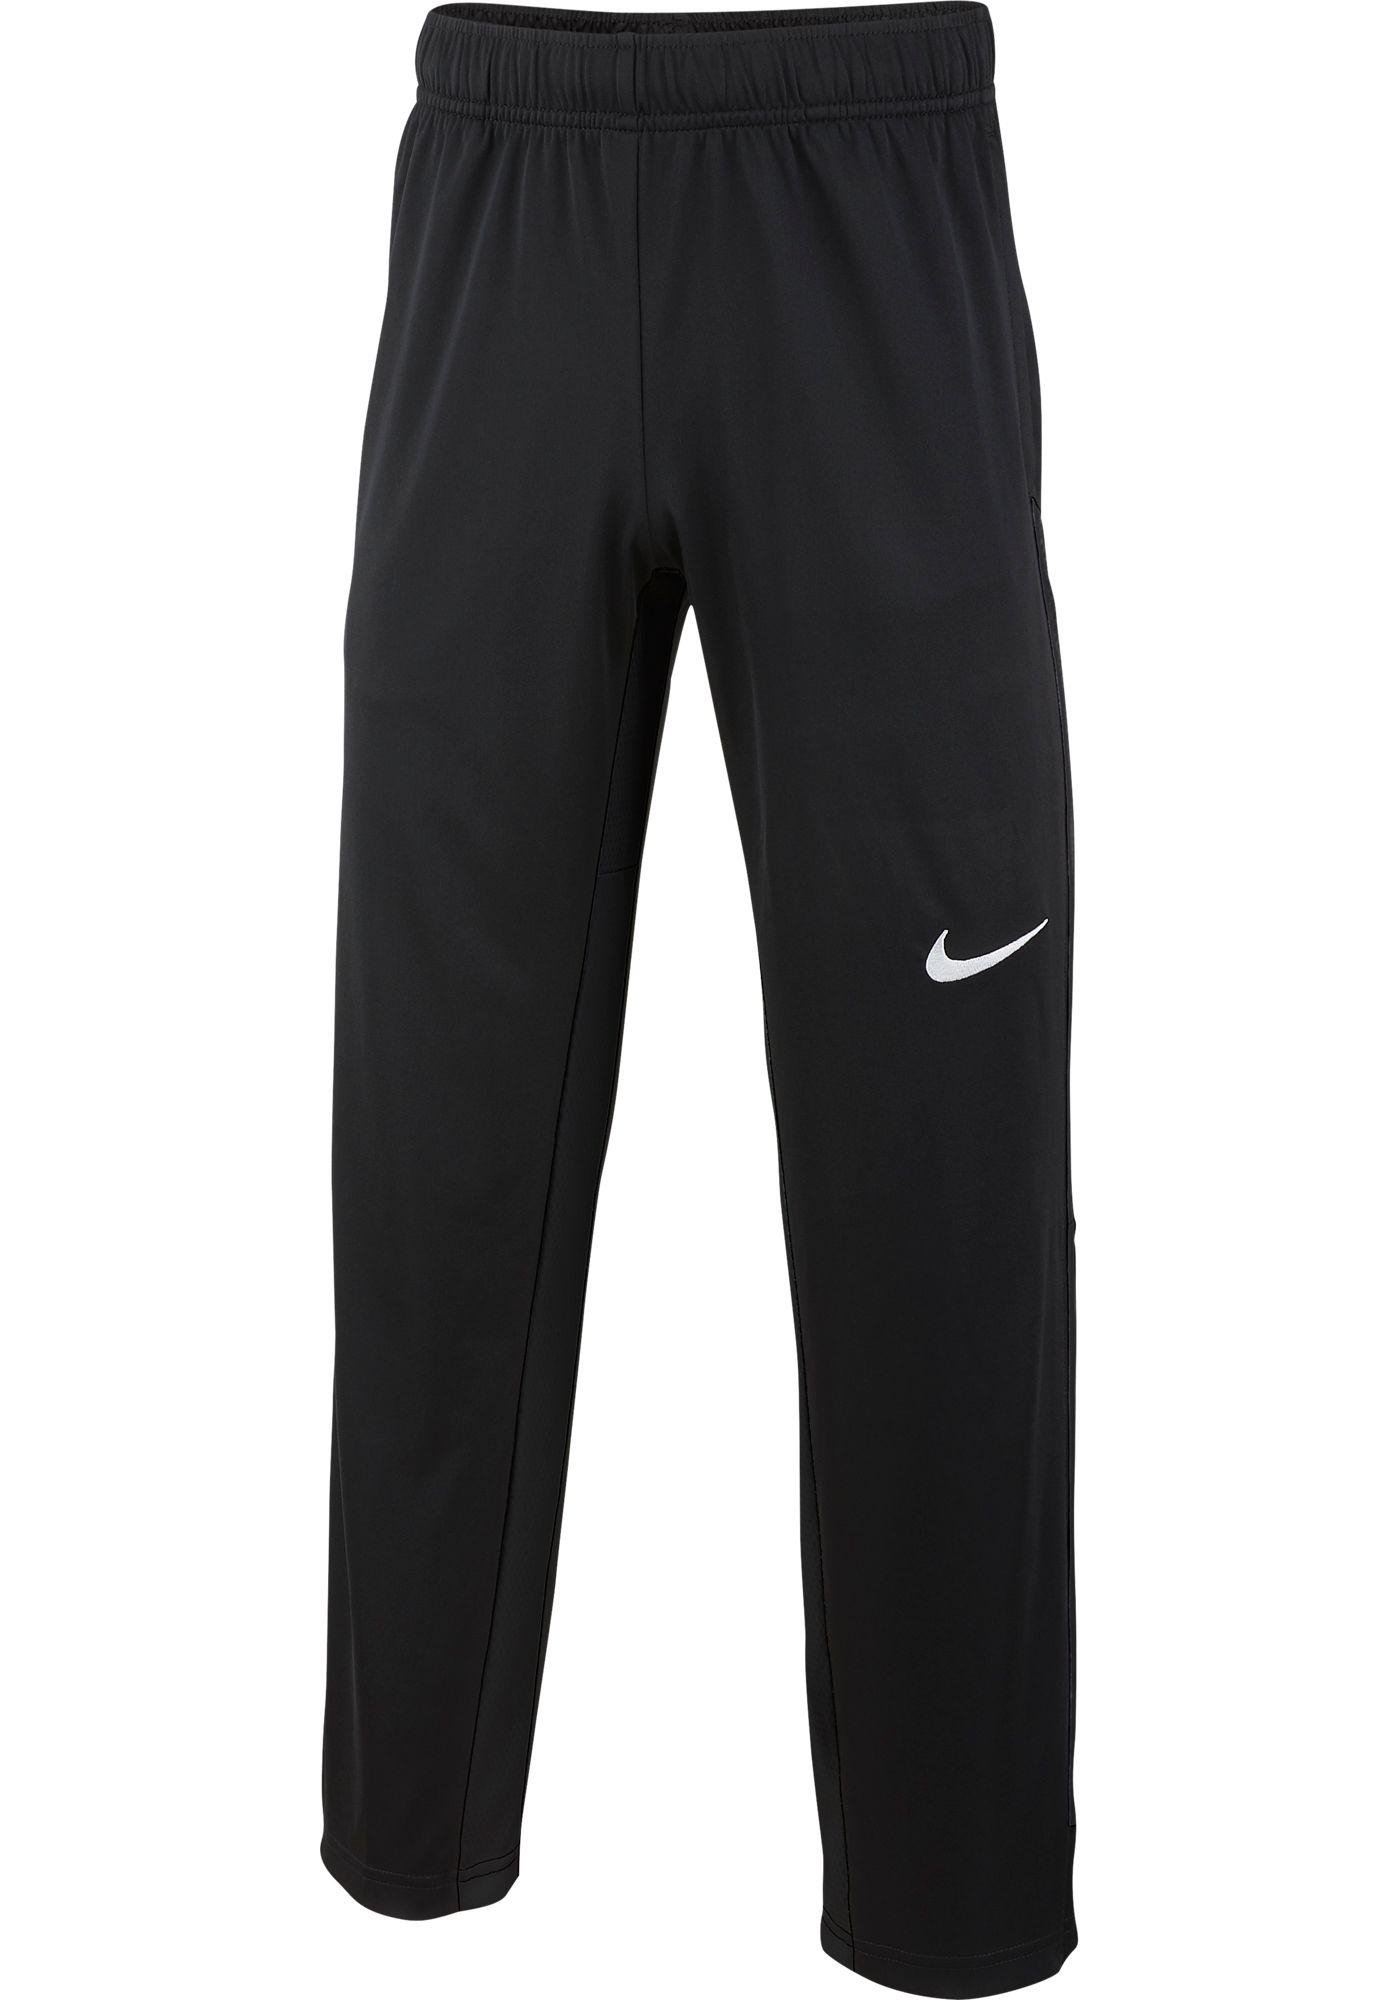 Nike Boys' Dri-FIT Trophy Training Pants